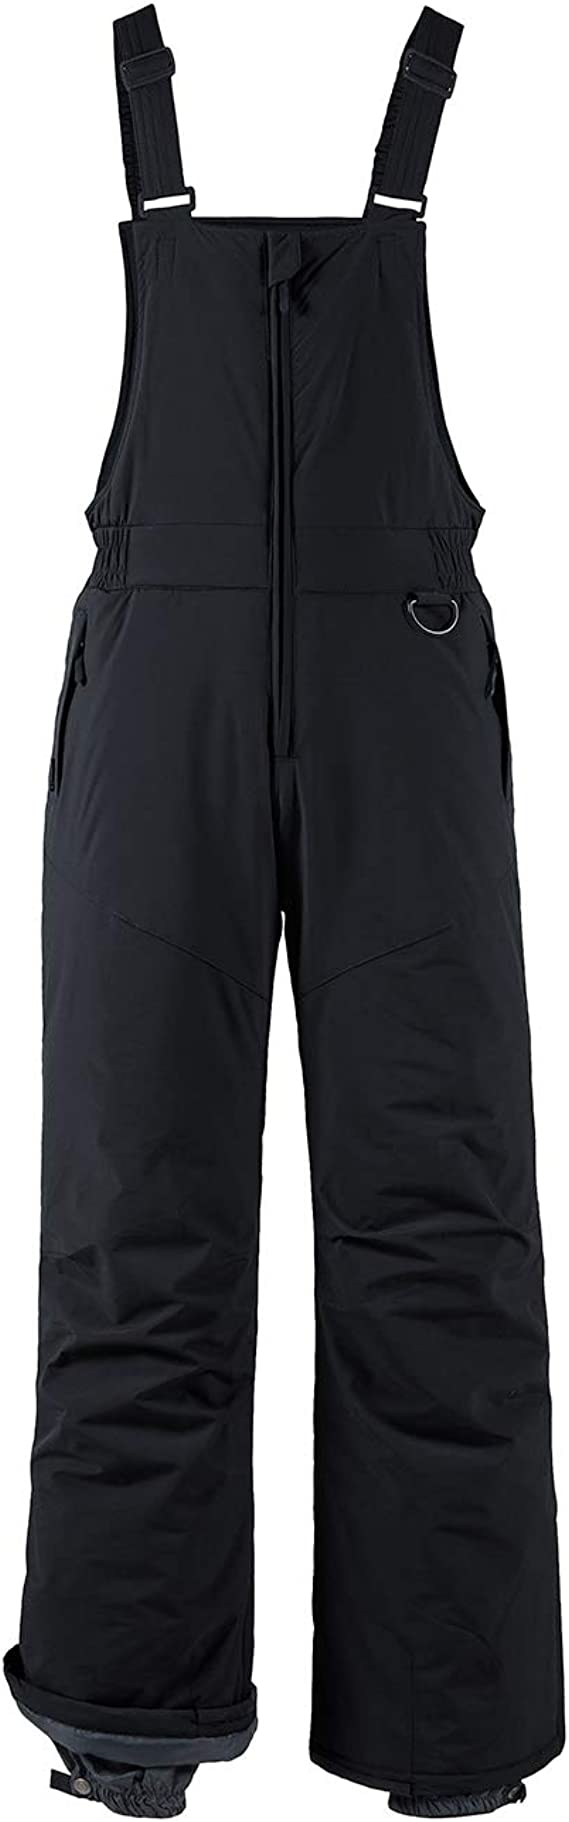 Wantdo Boys Waterproof Skiing Bibs Fleece Lined Snow Pants